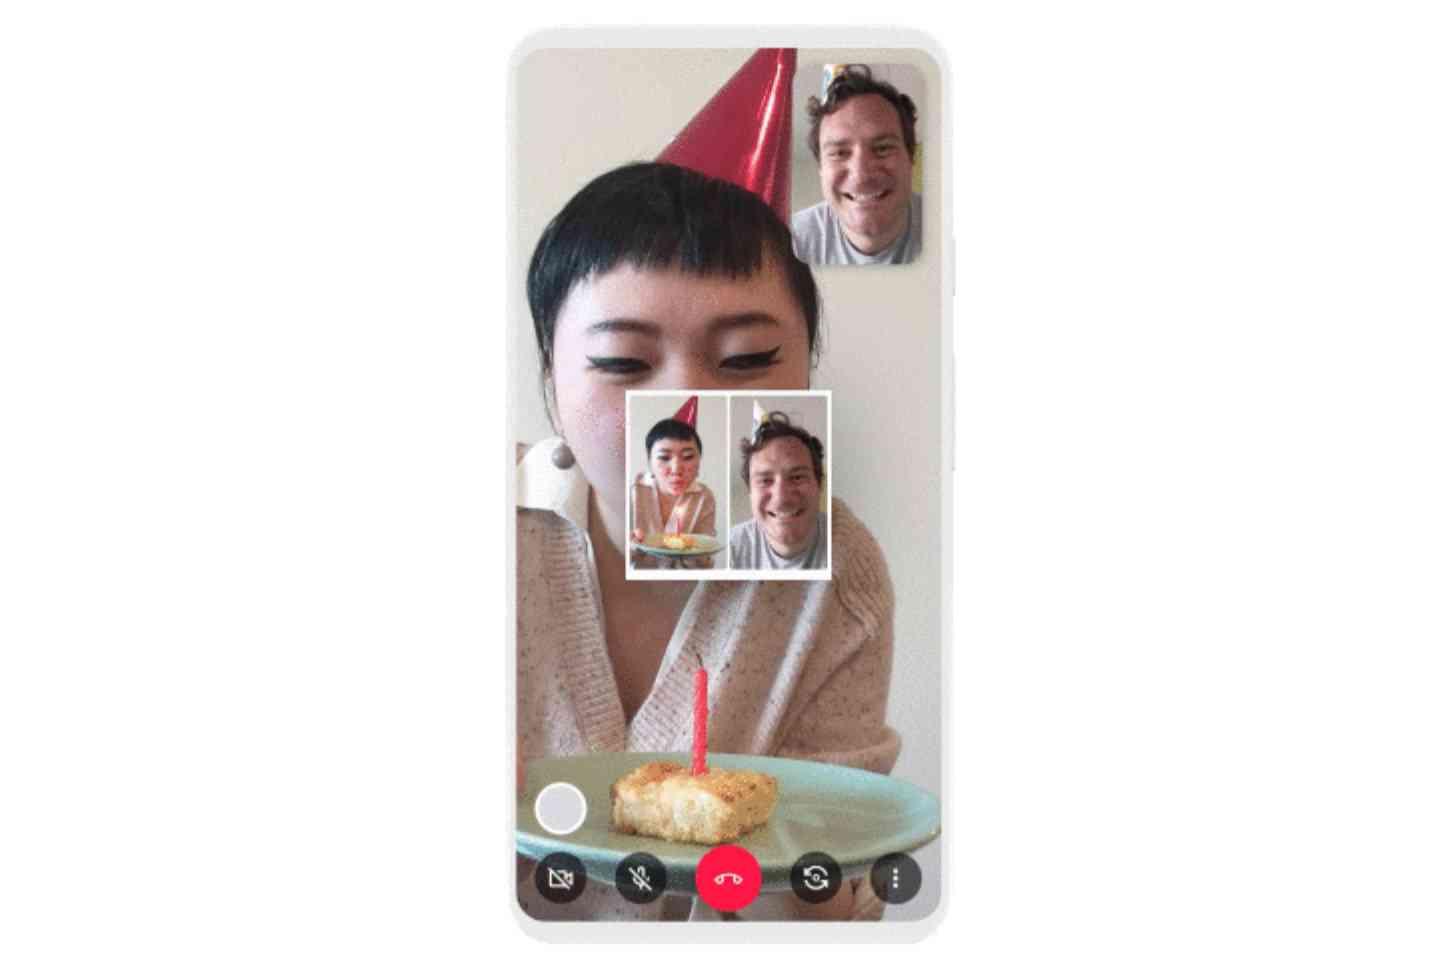 Google Duo snapshot feature